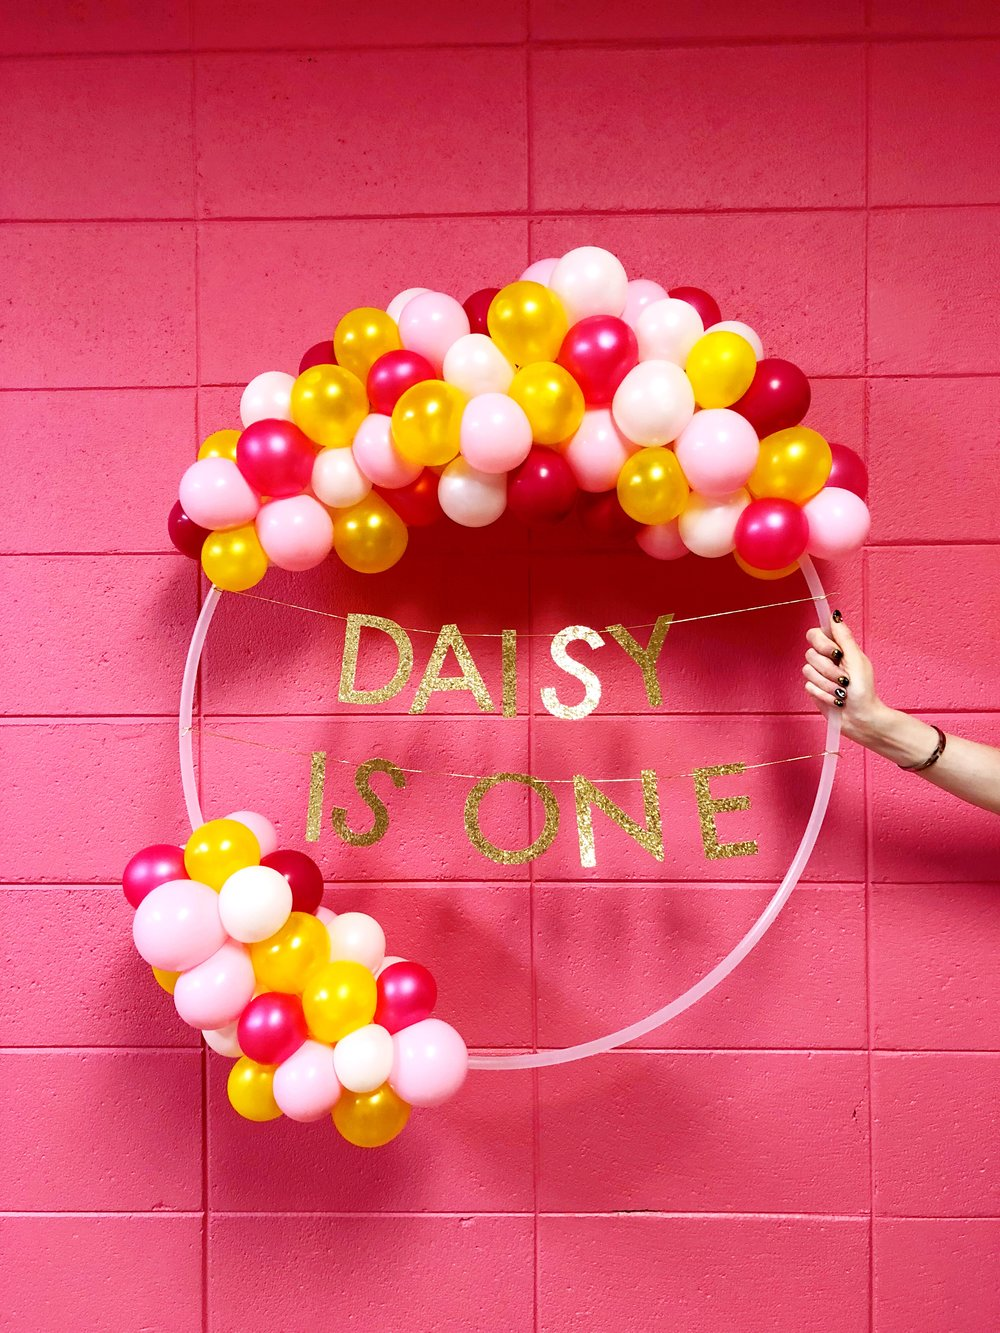 vroom_vroom_balloon_wreath_pink_one_first_birthday.JPG